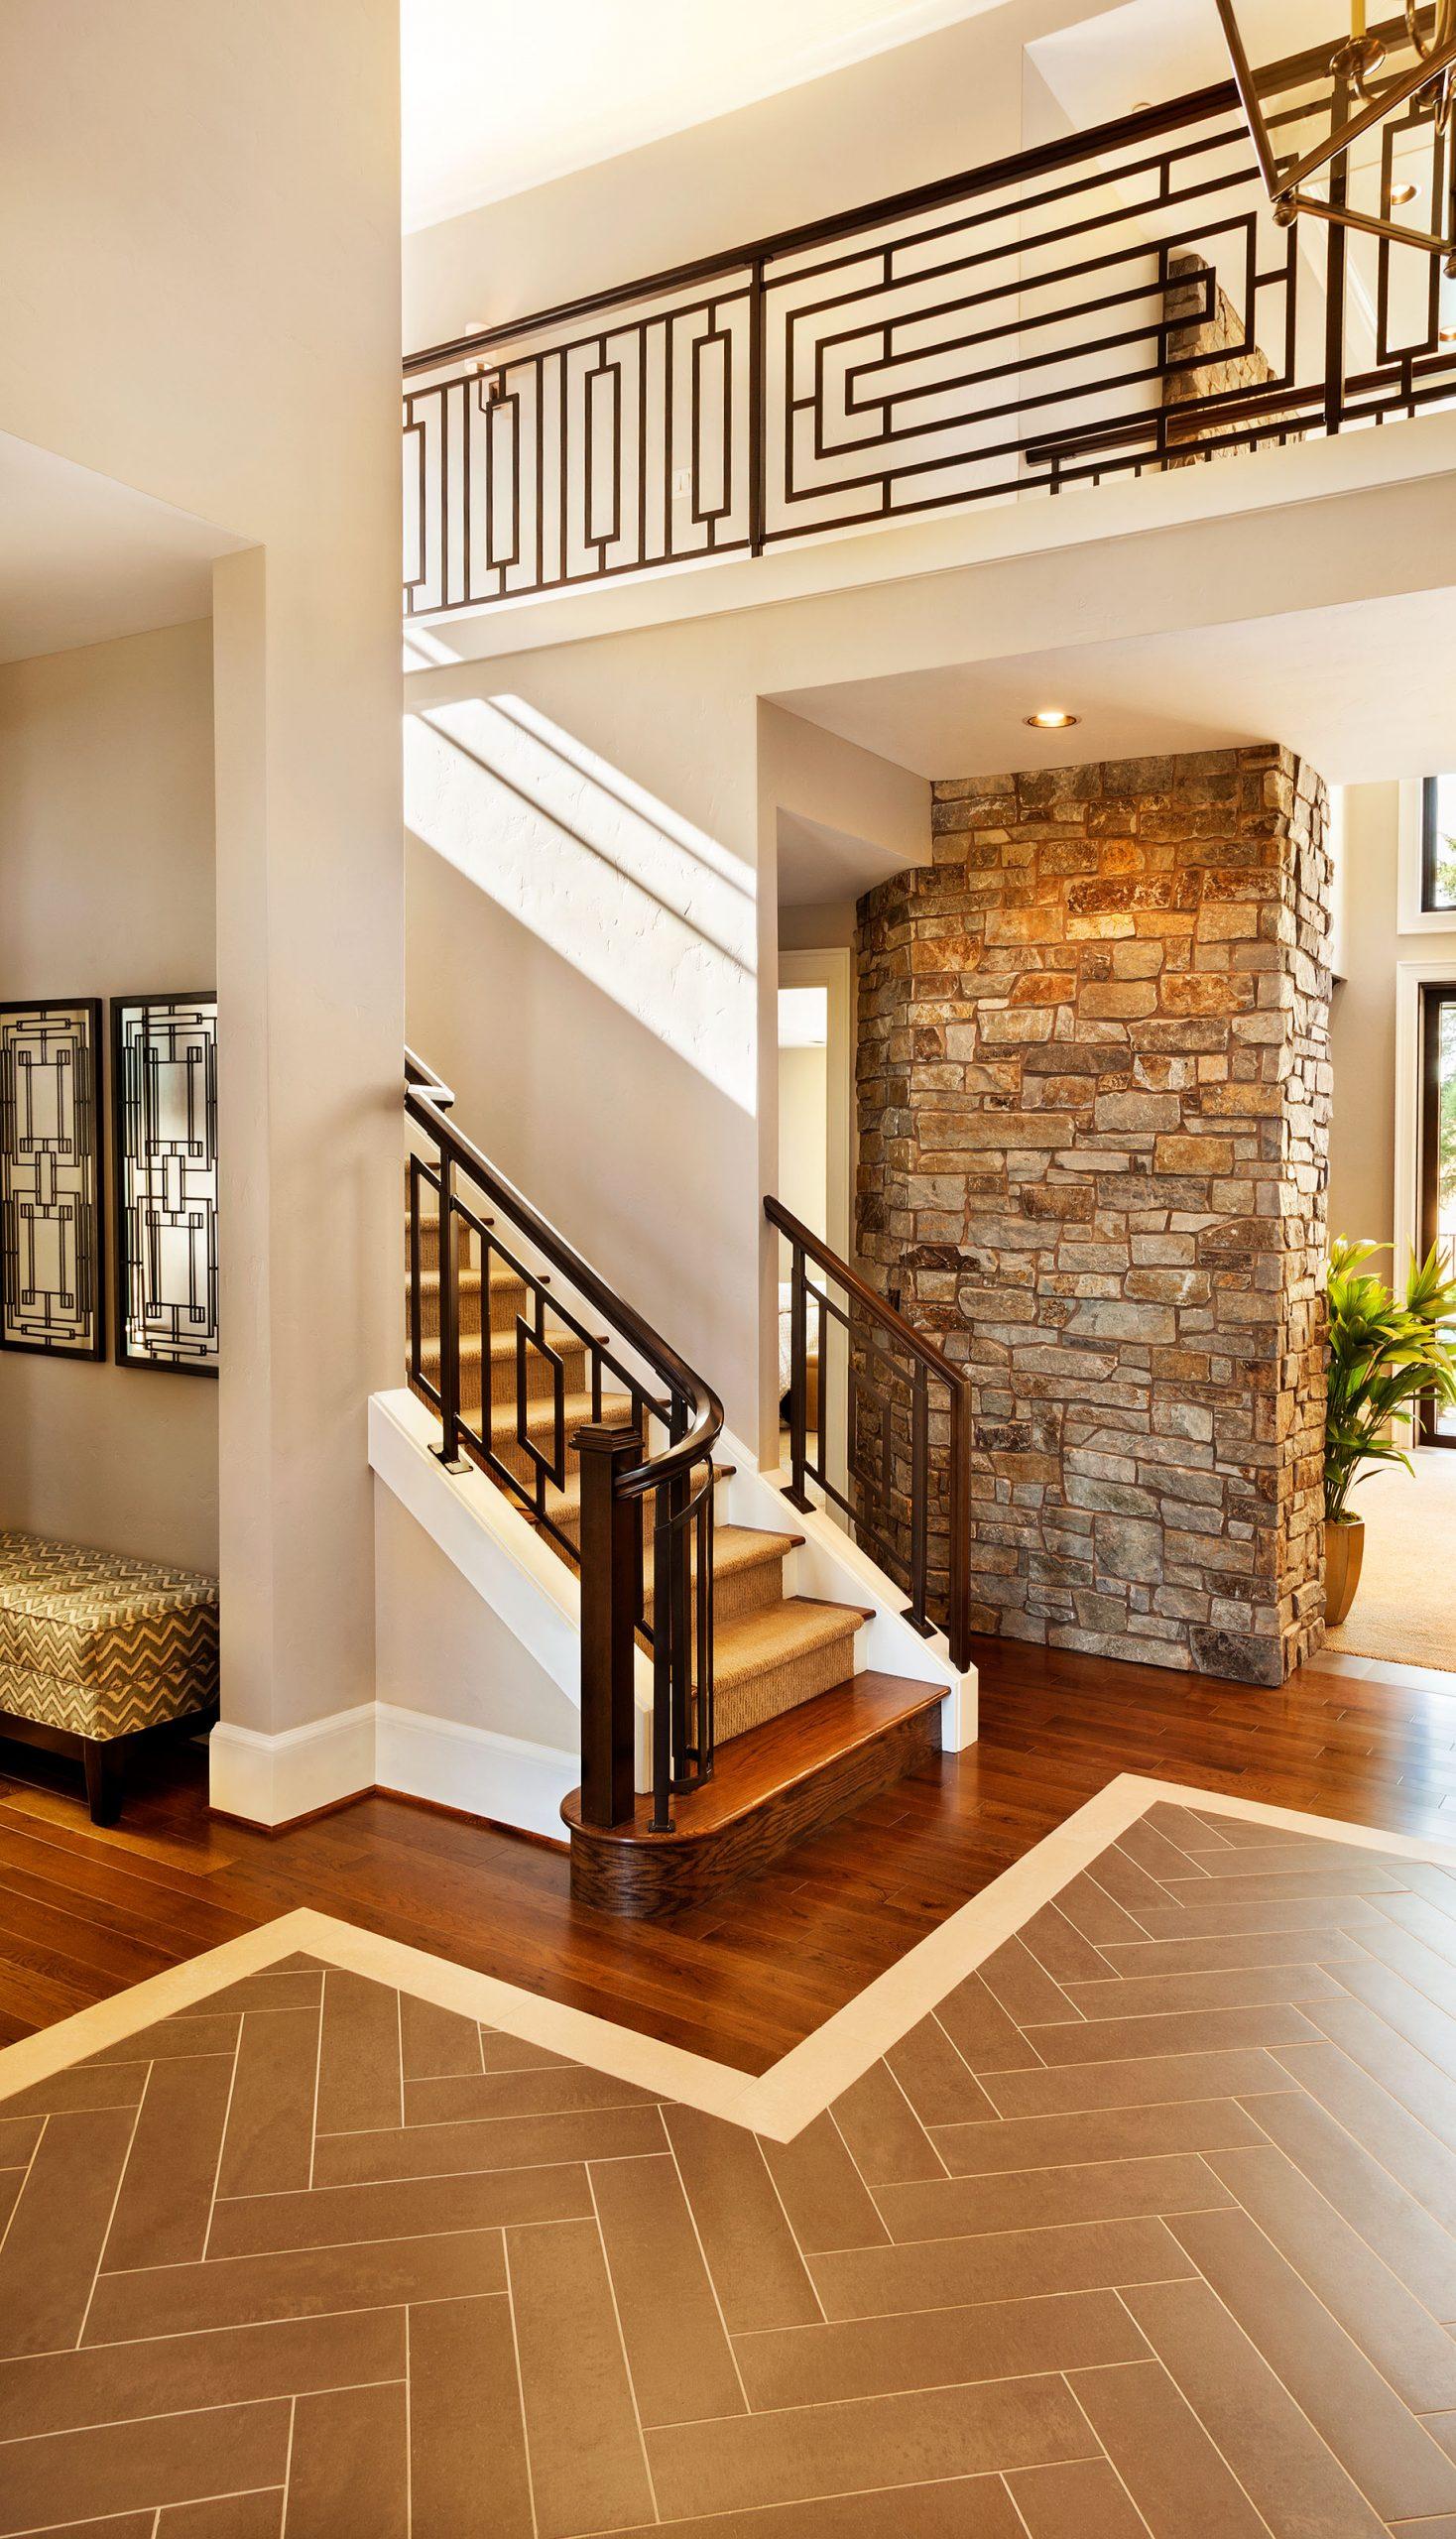 mw design workshop custom rail balustrade stairs